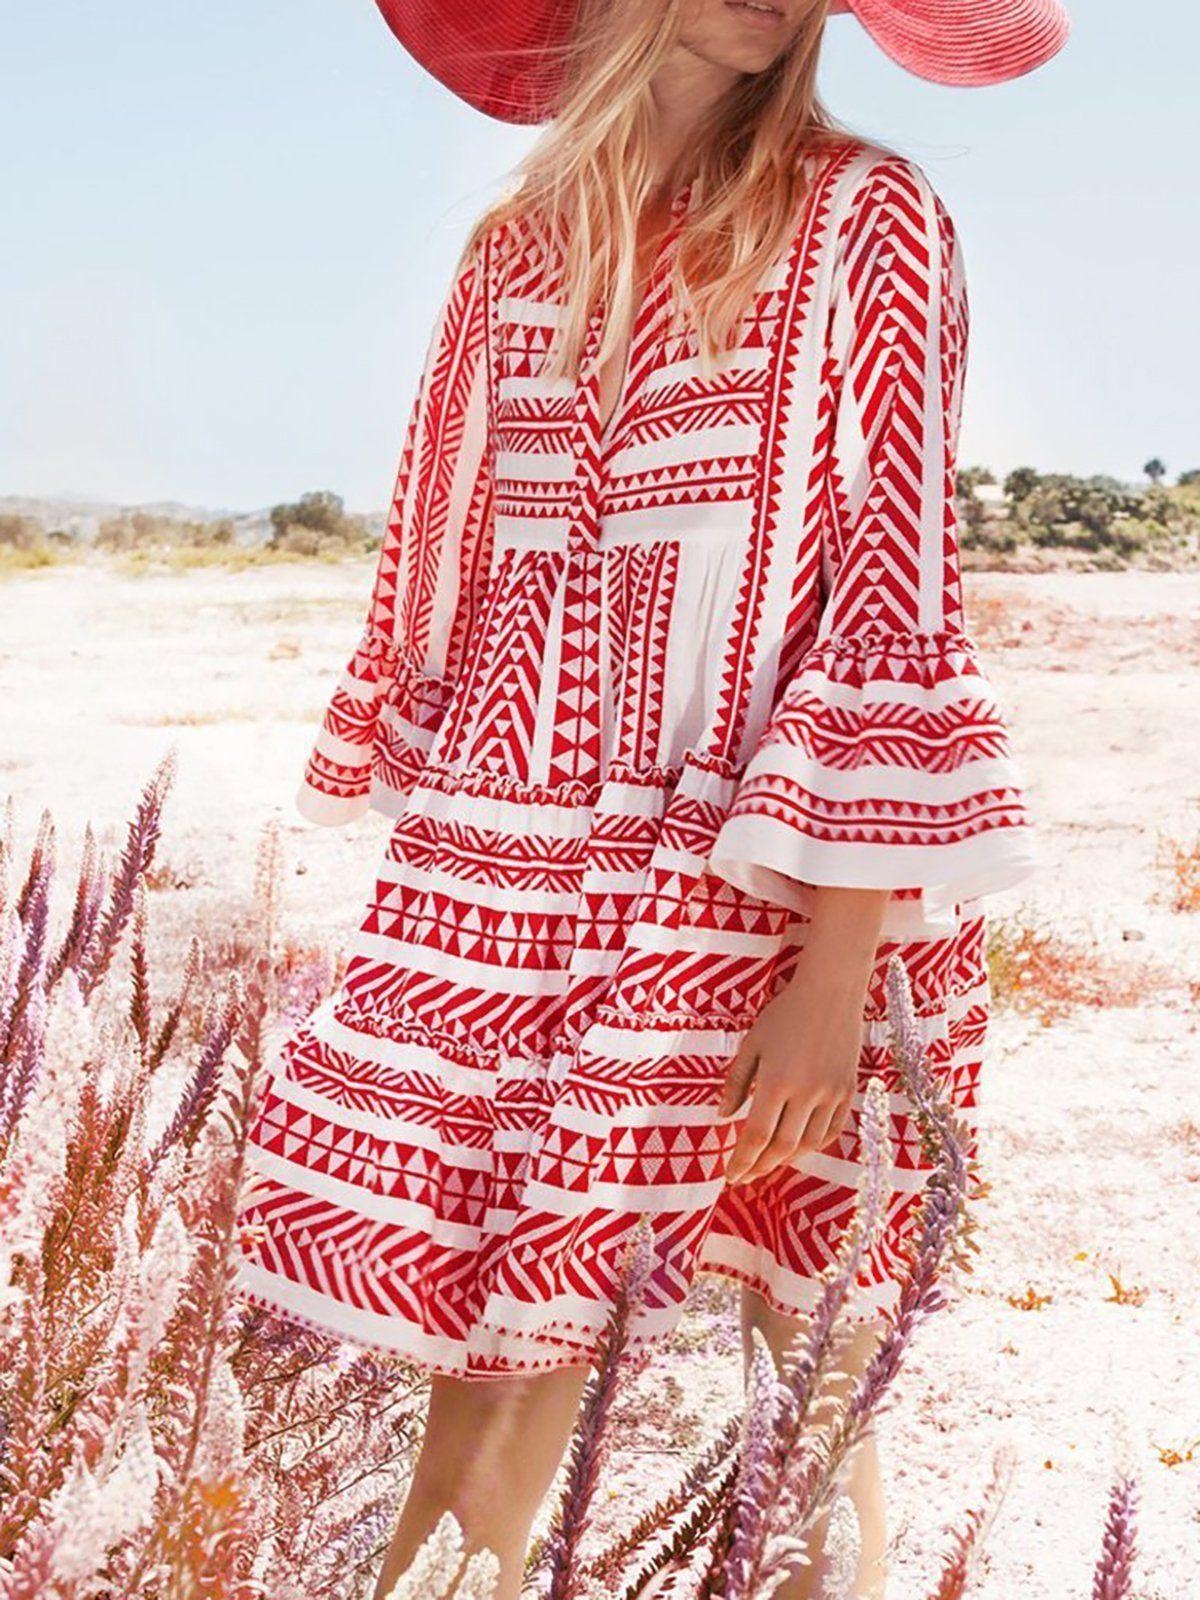 Plus Size Summer Dress for Women Mini Boho Dress Boho Print Dress Tribal Hippie Dress Boho Dress Bohemian Dress Floral Fashion Dress